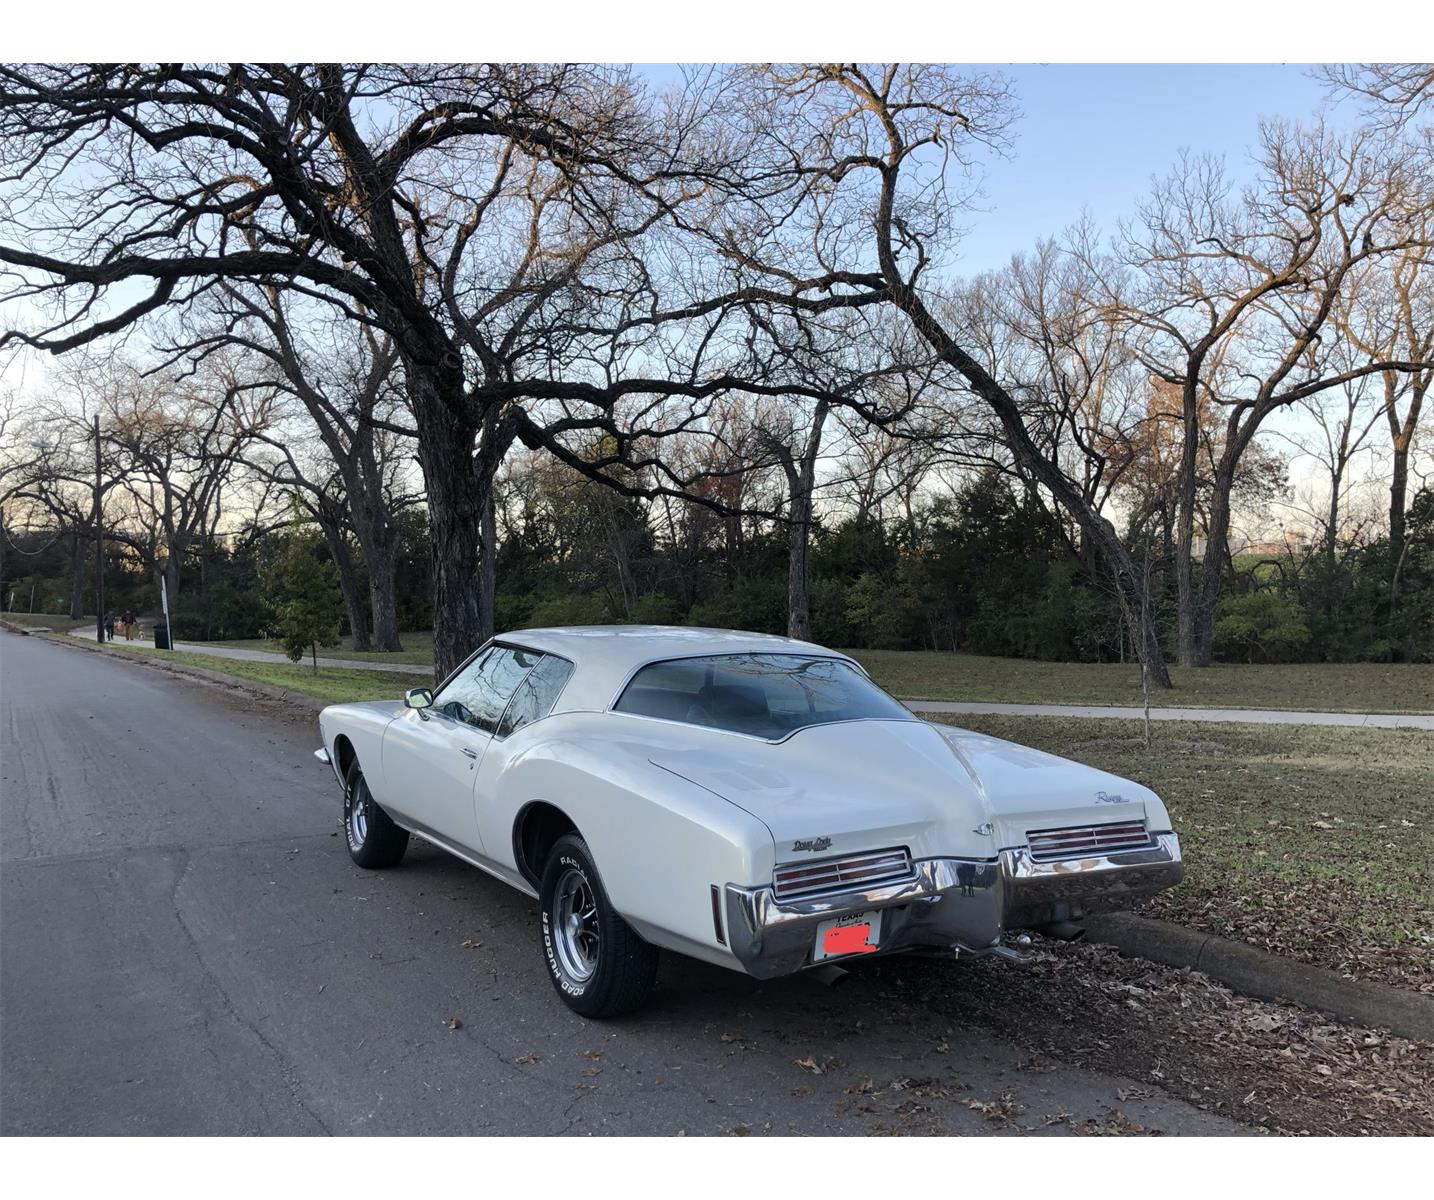 1971 Buick Riviera for Sale | ClassicCars.com | CC-1171602